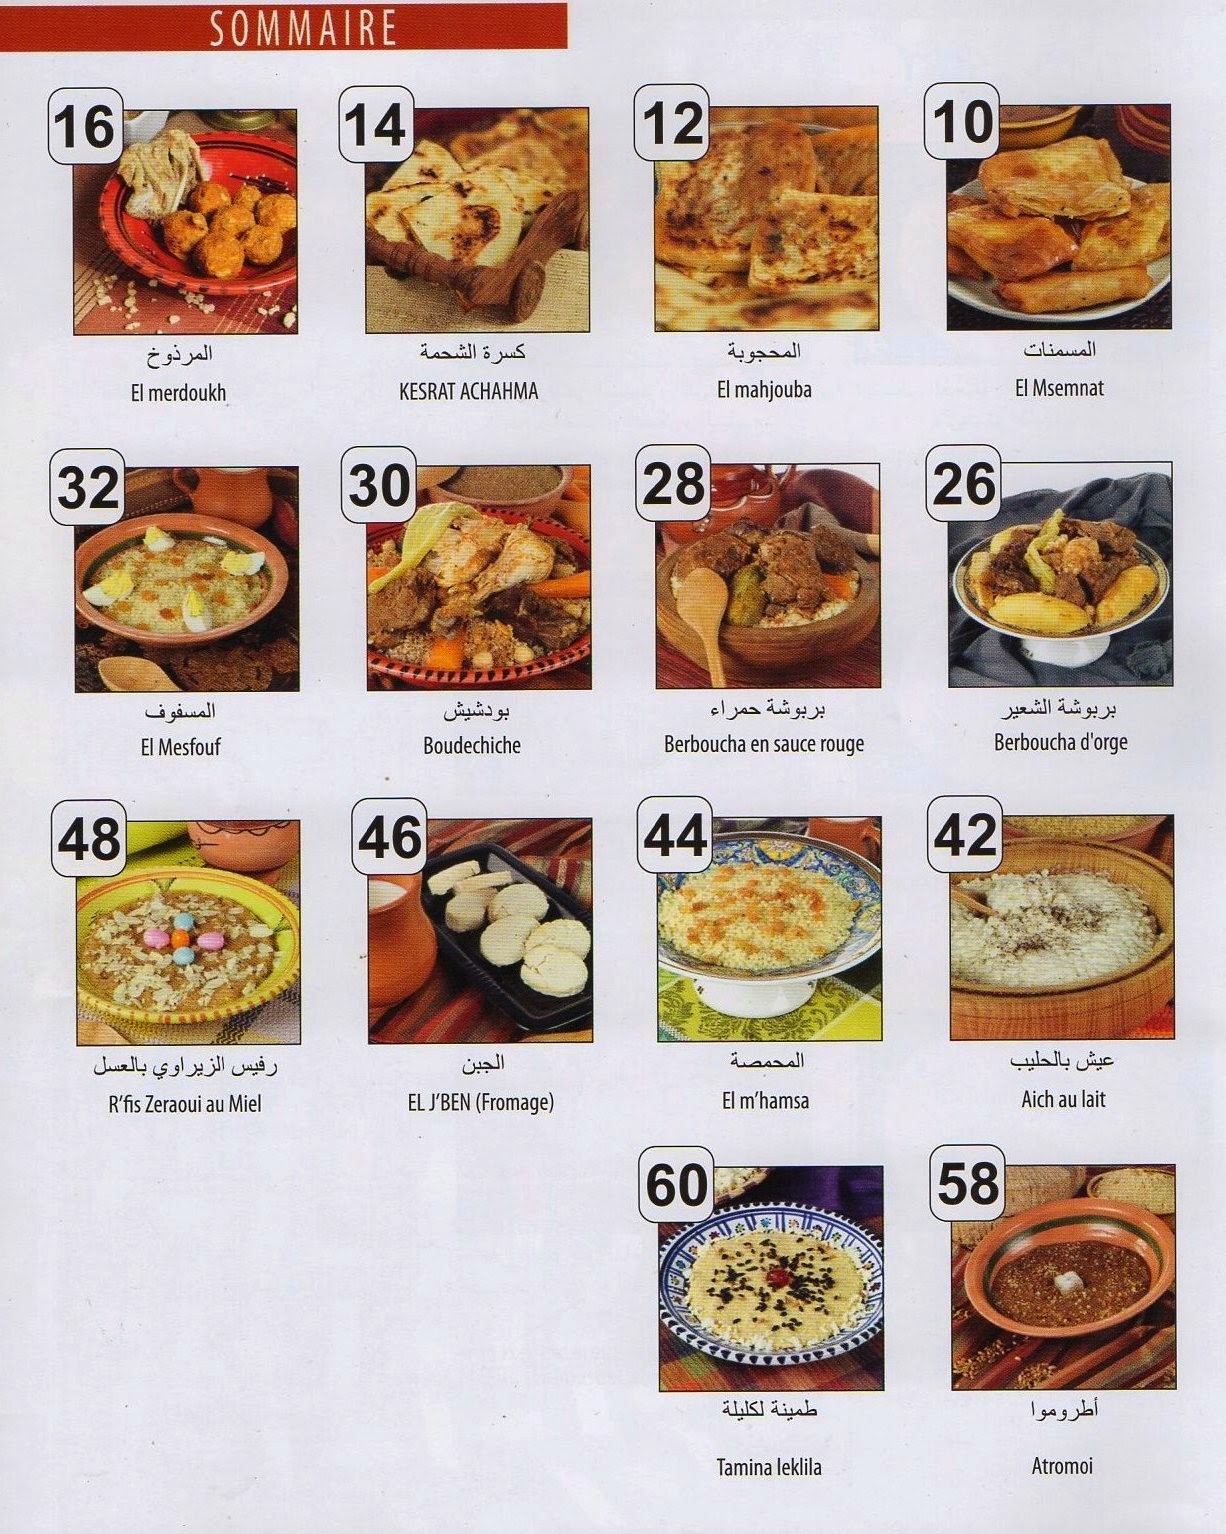 la cuisine alg 233 rienne cuisine facile plats chaoui 30 recettes الطبخ السهل الطبخ الشاوي